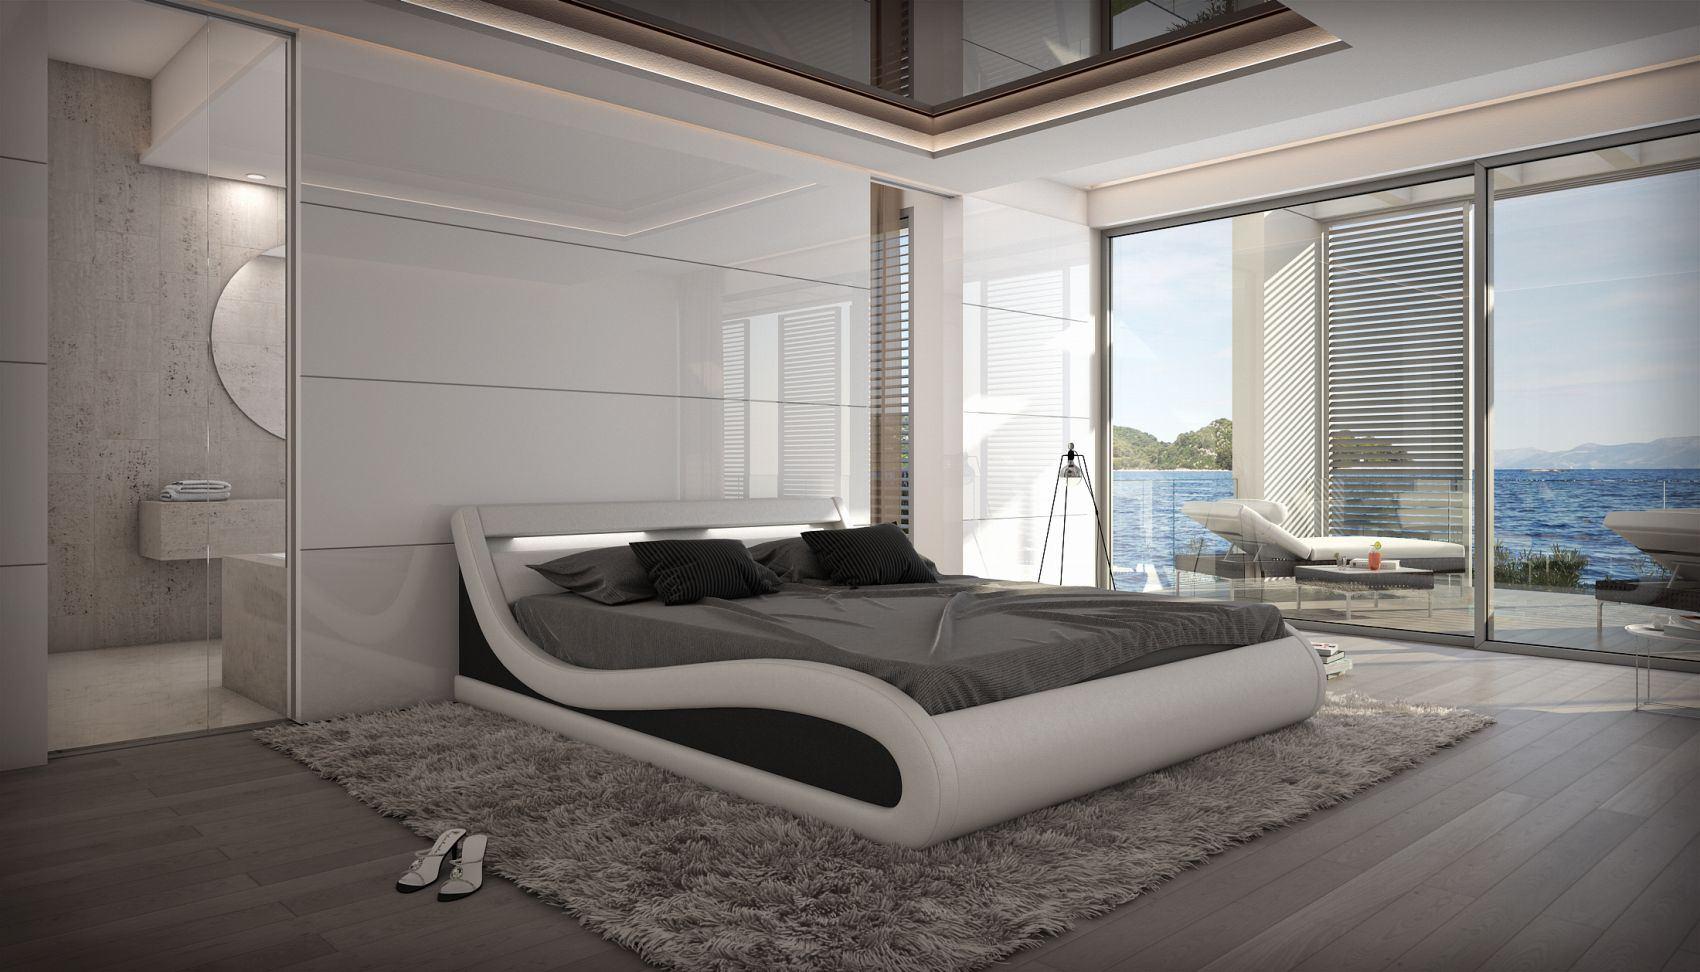 Wasserbett CASERTA Dualsystem Komplettset Softside Design Rahmen | eBay